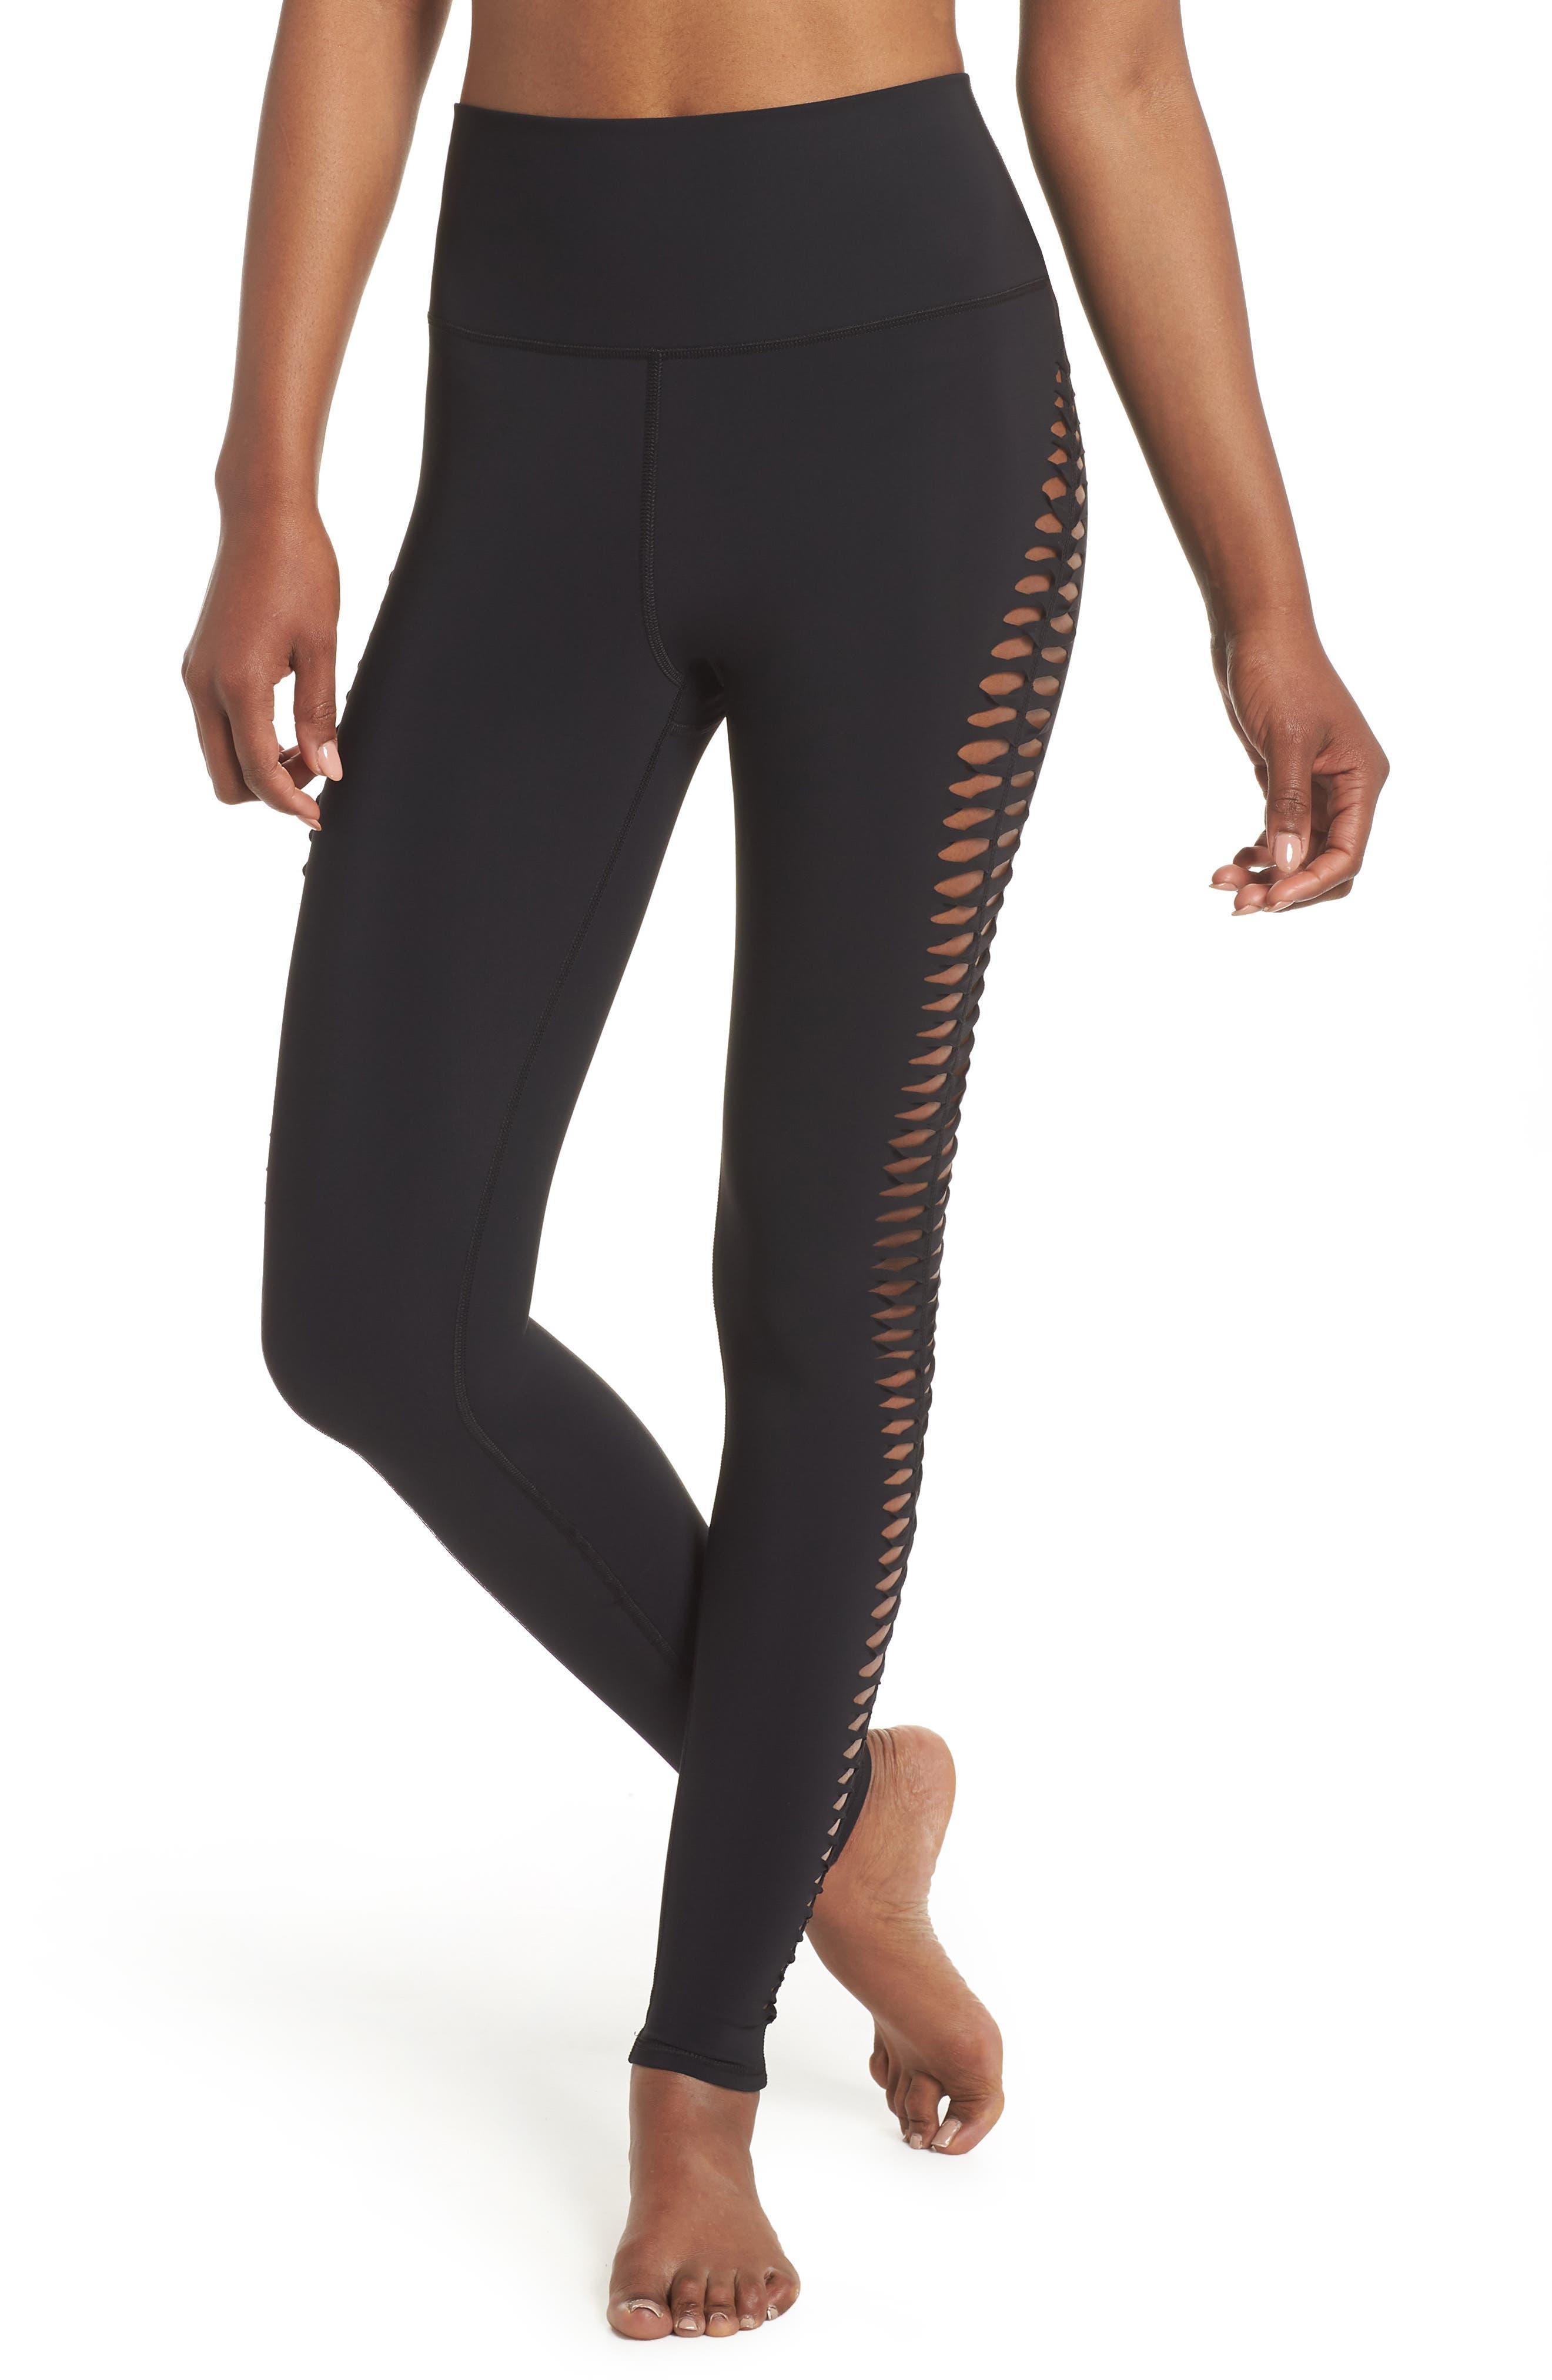 Reform Leggings,                         Main,                         color, Black